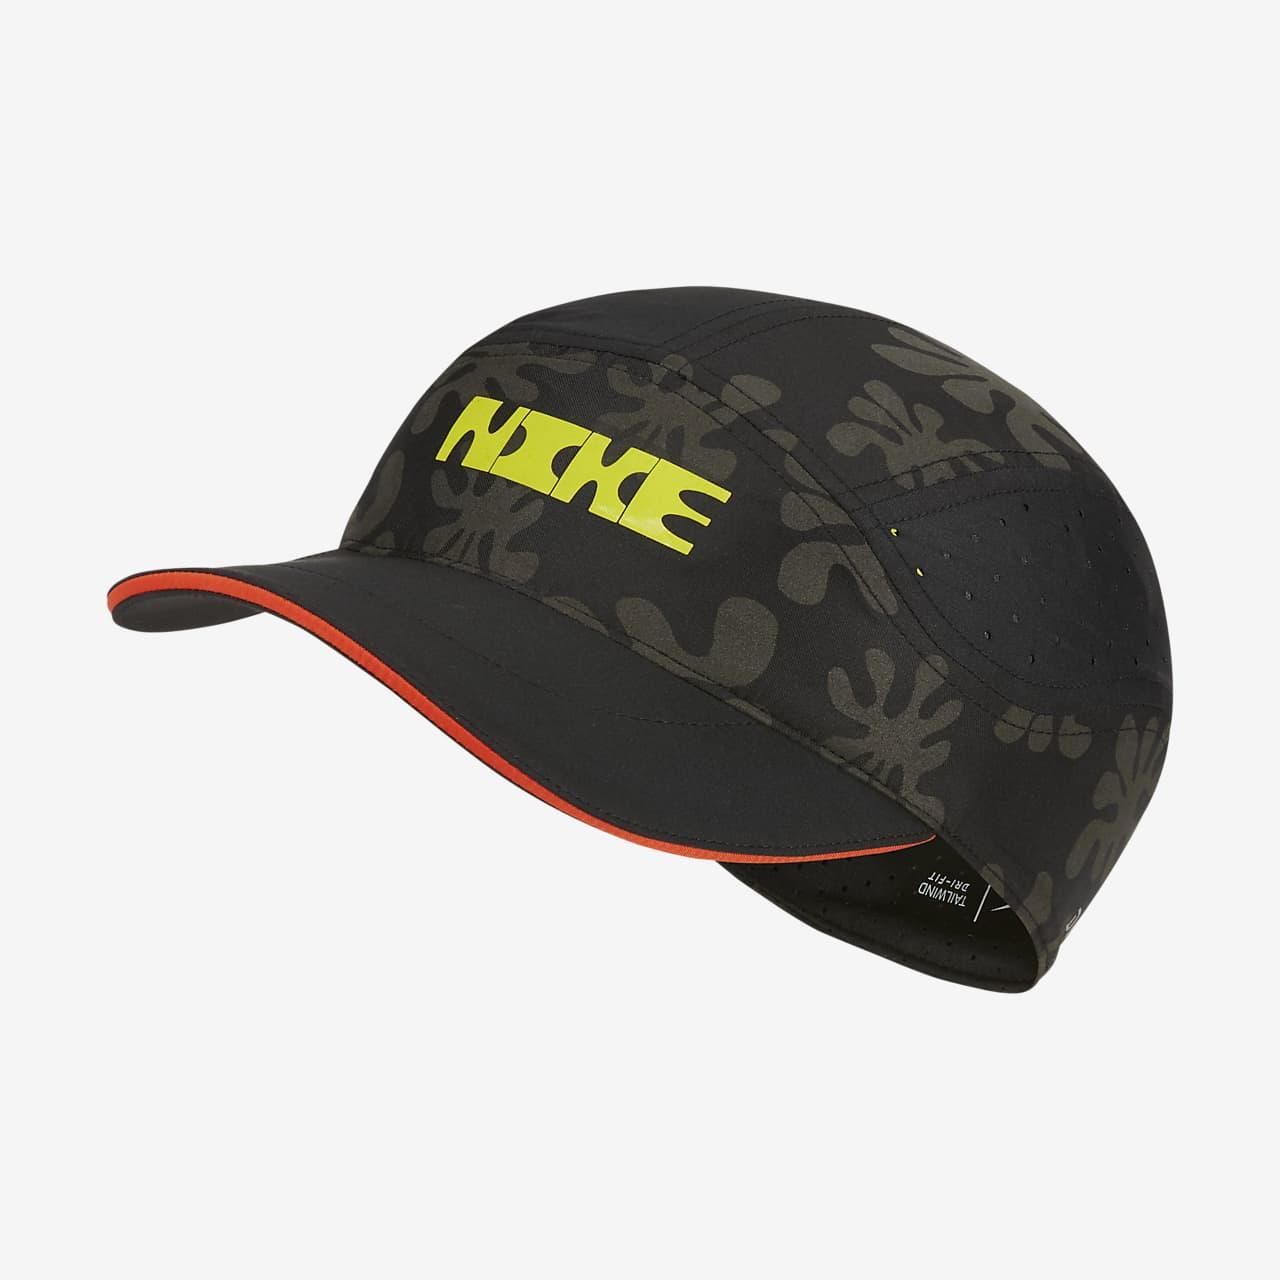 Nike AeroBill Tailwind A.I.R. Chaz Bear Running Cap